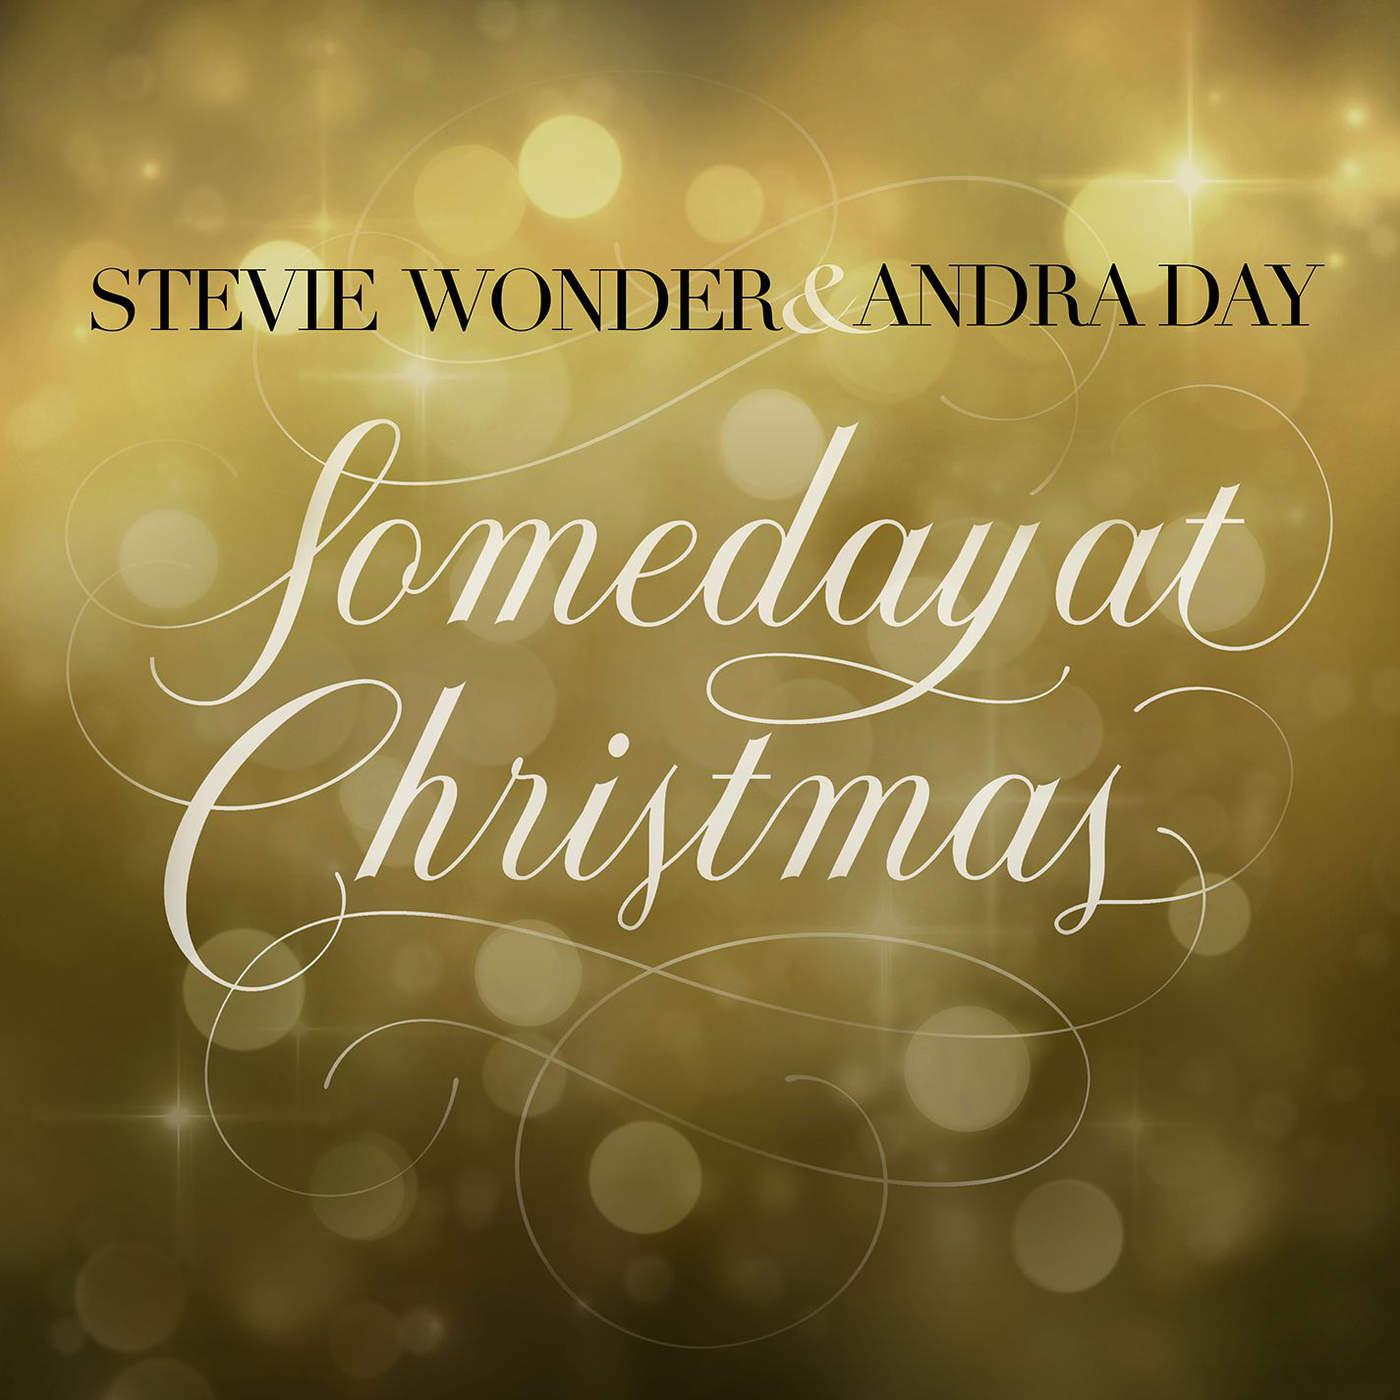 Stevie Wonder & Andra Day - Someday at Christmas - Single